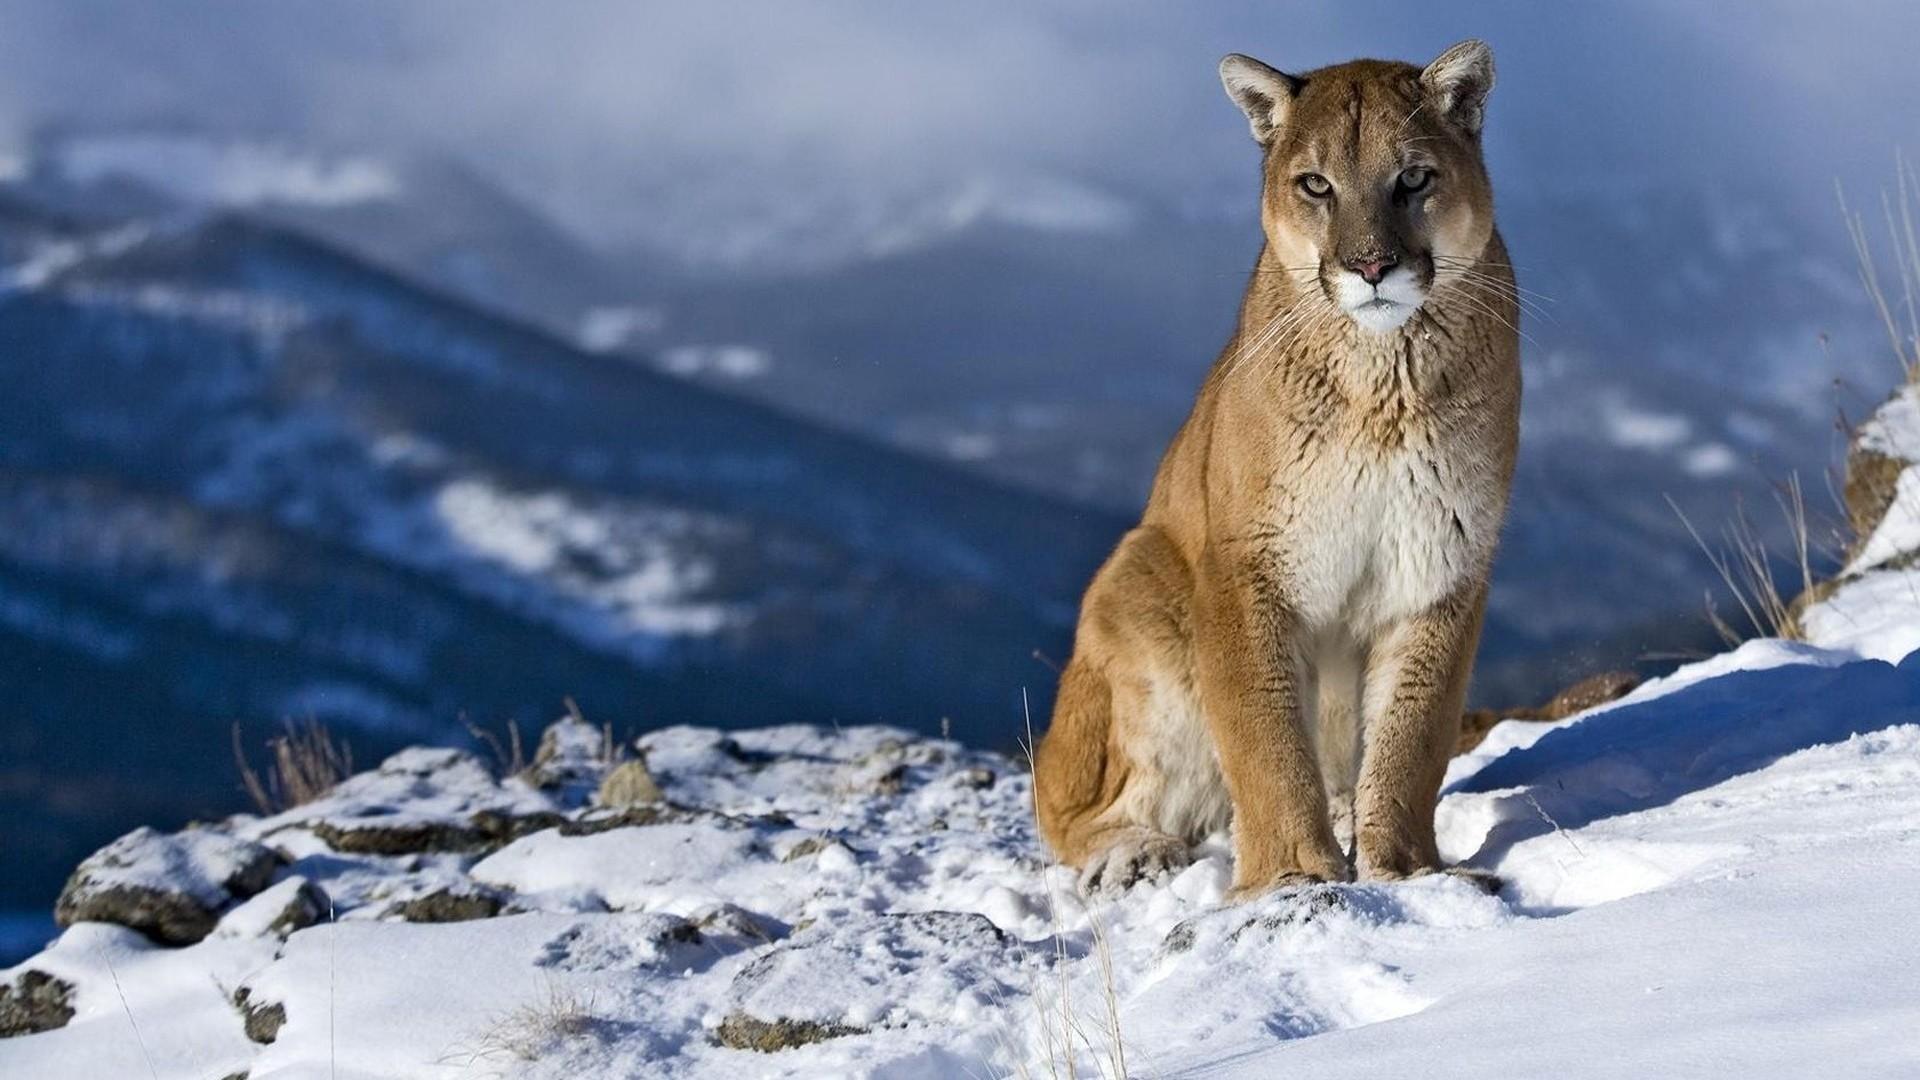 … Background Full HD 1080p. Wallpaper cougar, snow, mountain,  sit, pretty